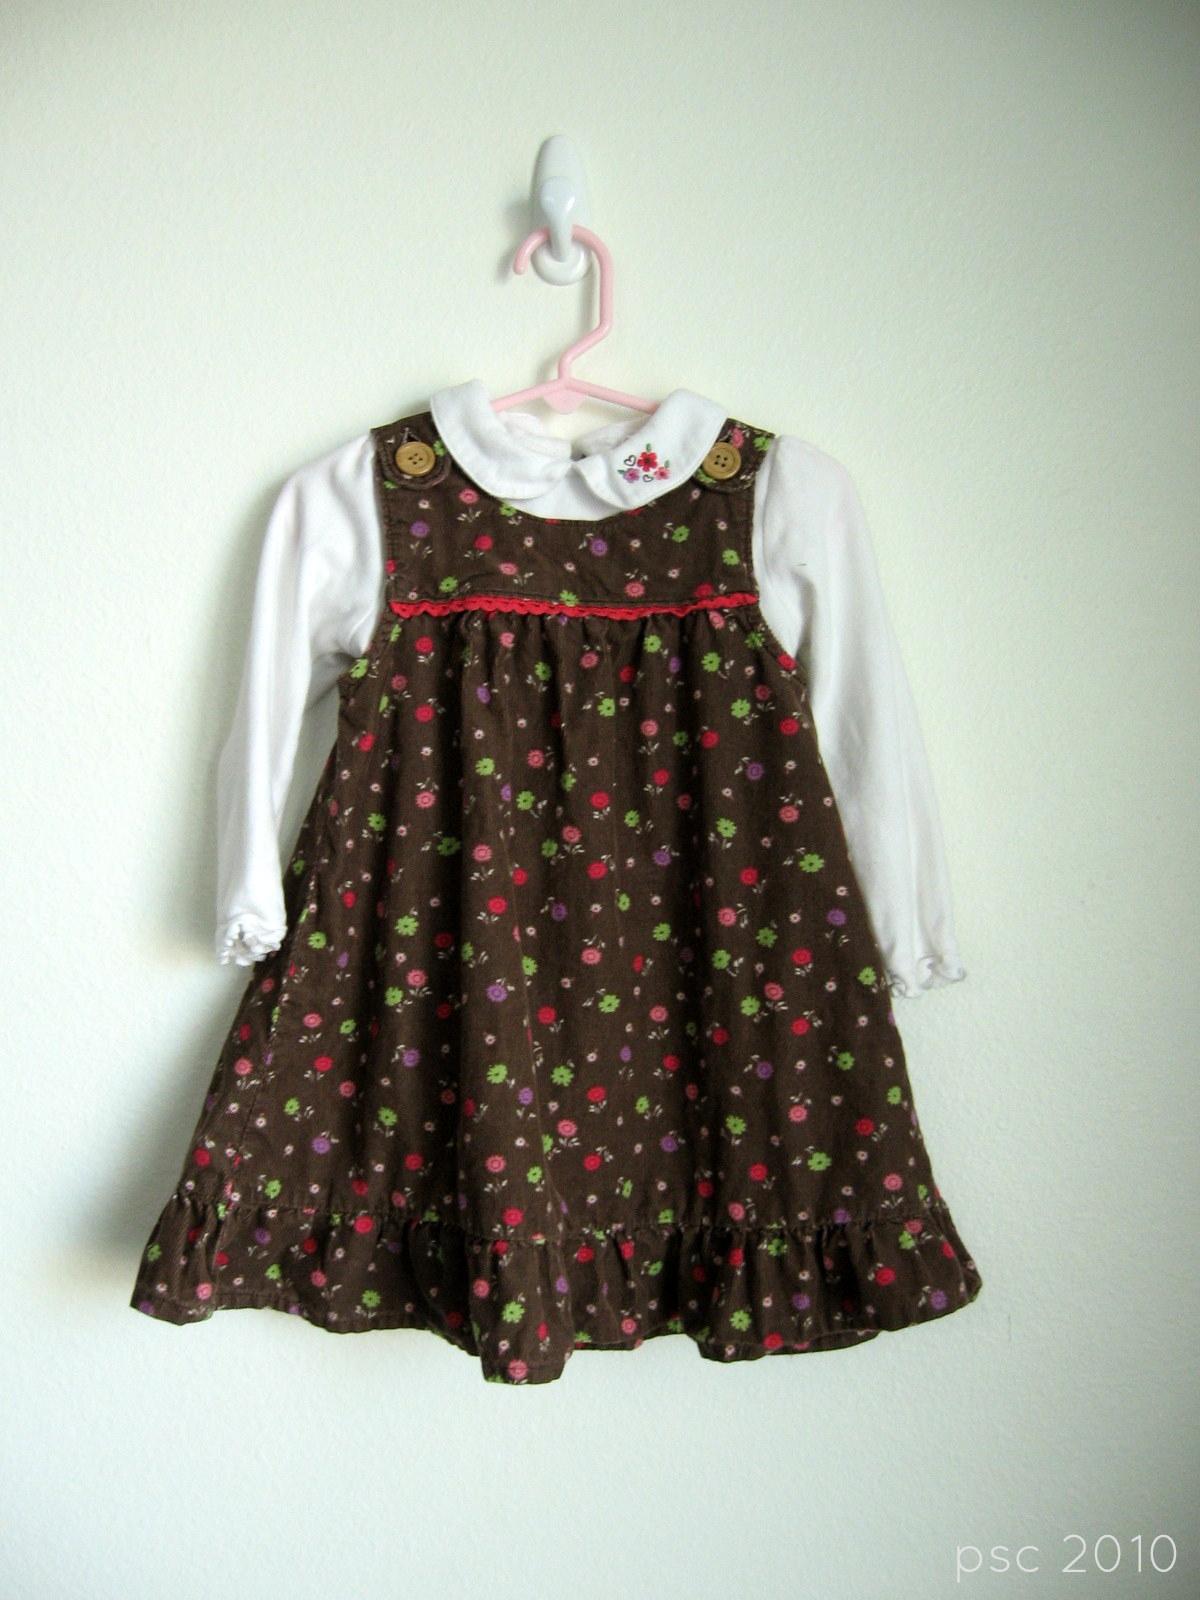 Pickup Some Creativity: New Summer Dresses